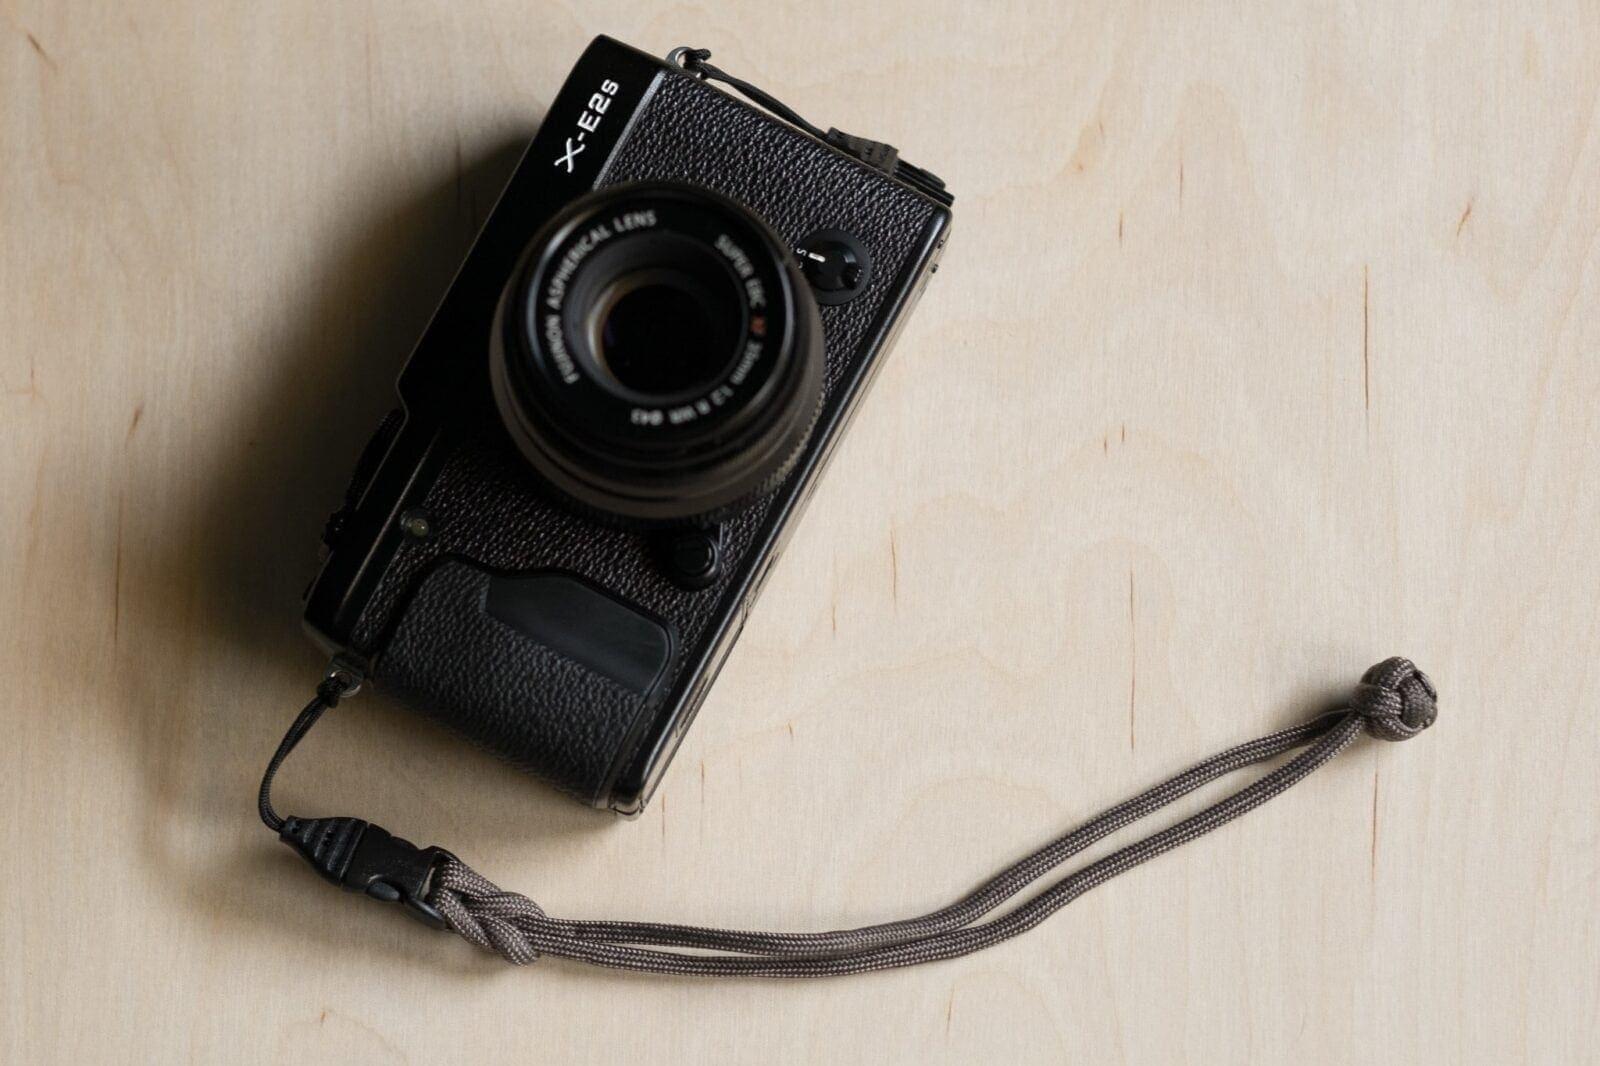 DIY Paracord Camera Wrist Strap attached to Fujifilm X-E2s